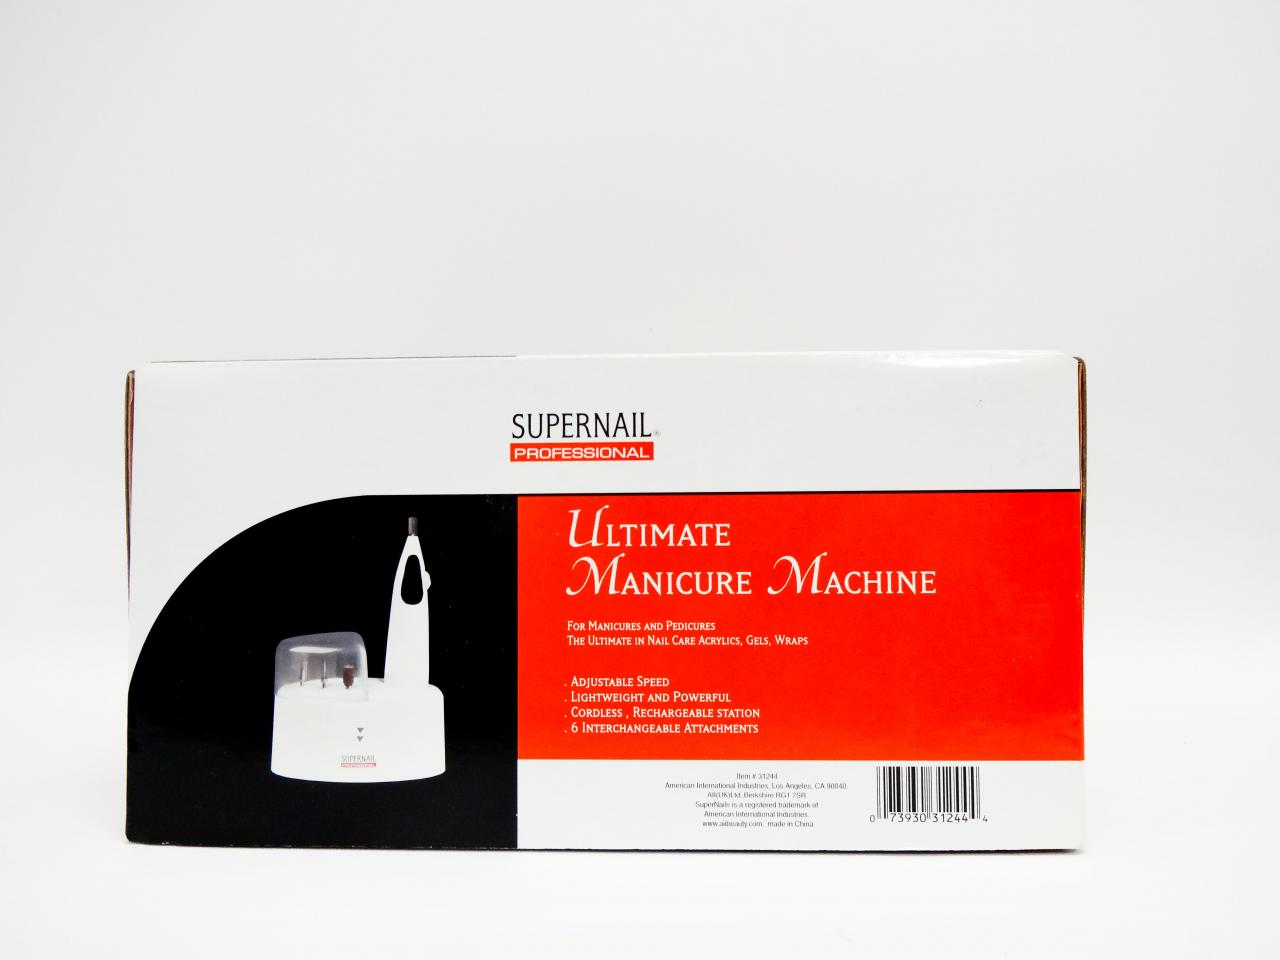 supernail ultimate manicure machine